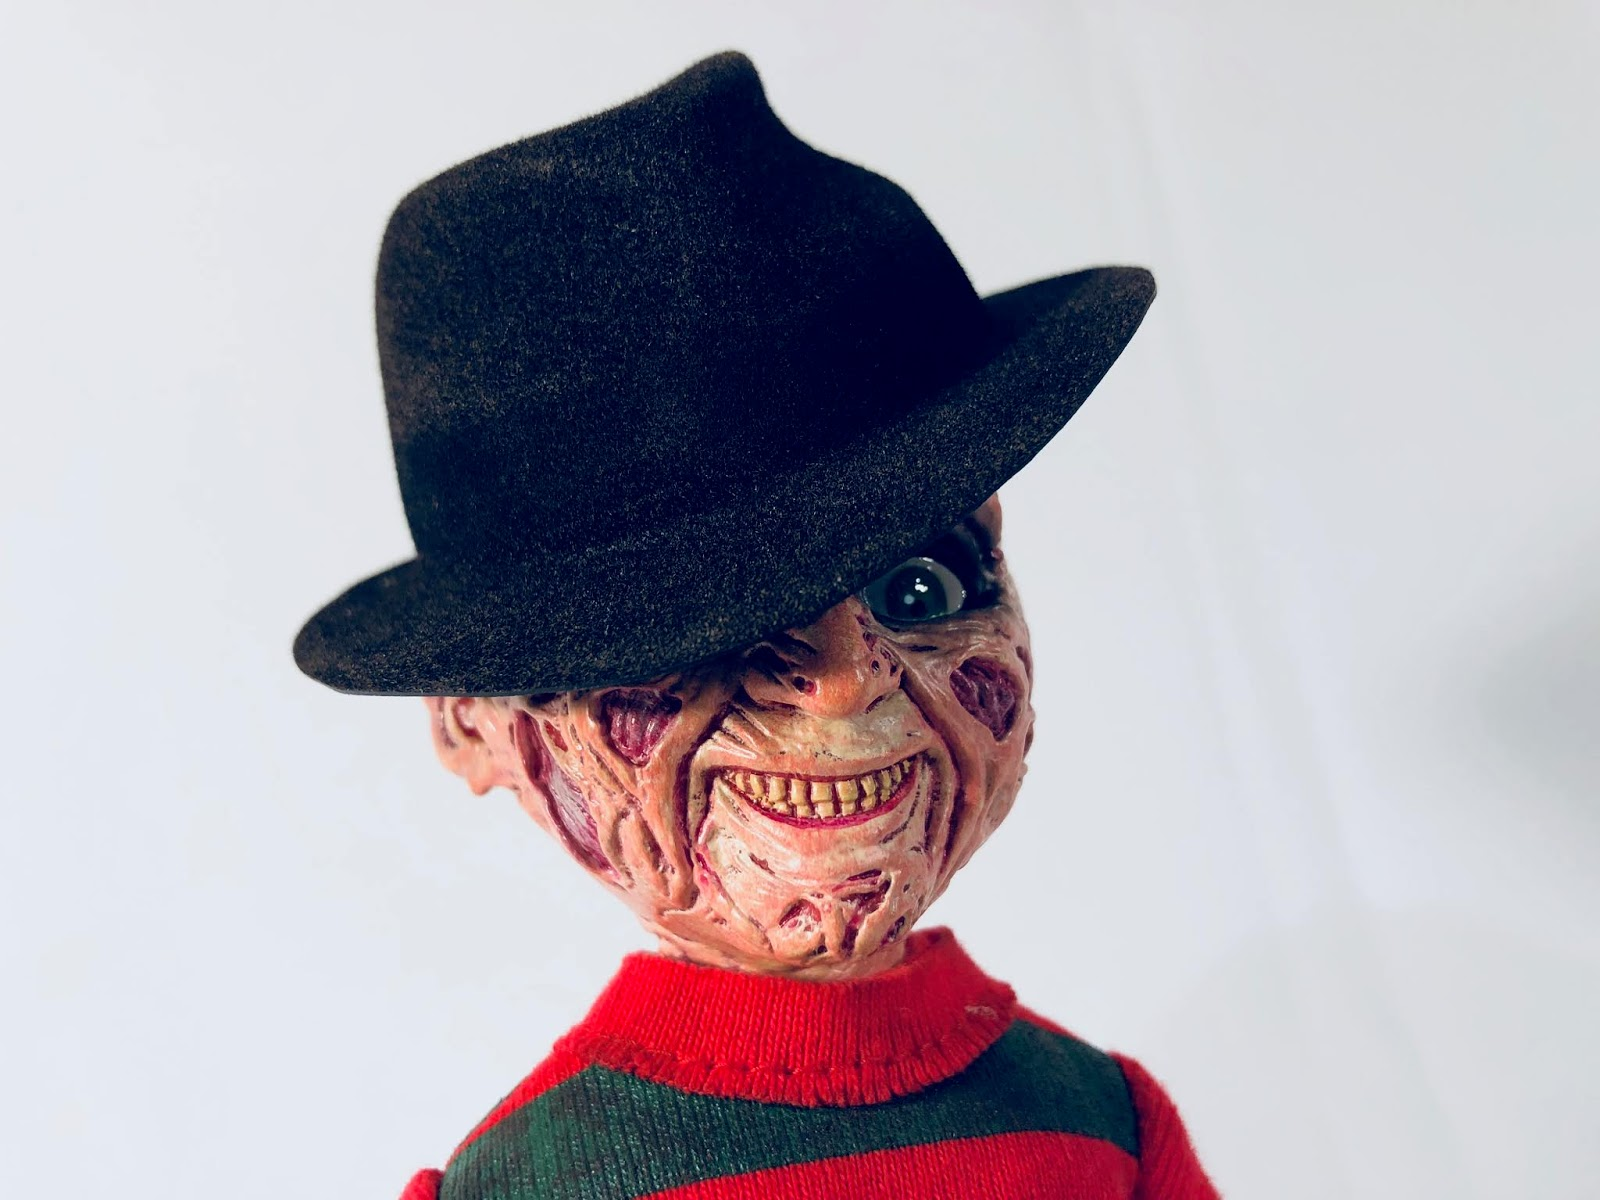 Living dead dolls Nightmare on Elm Street Talking Freddy Krueger Mezco